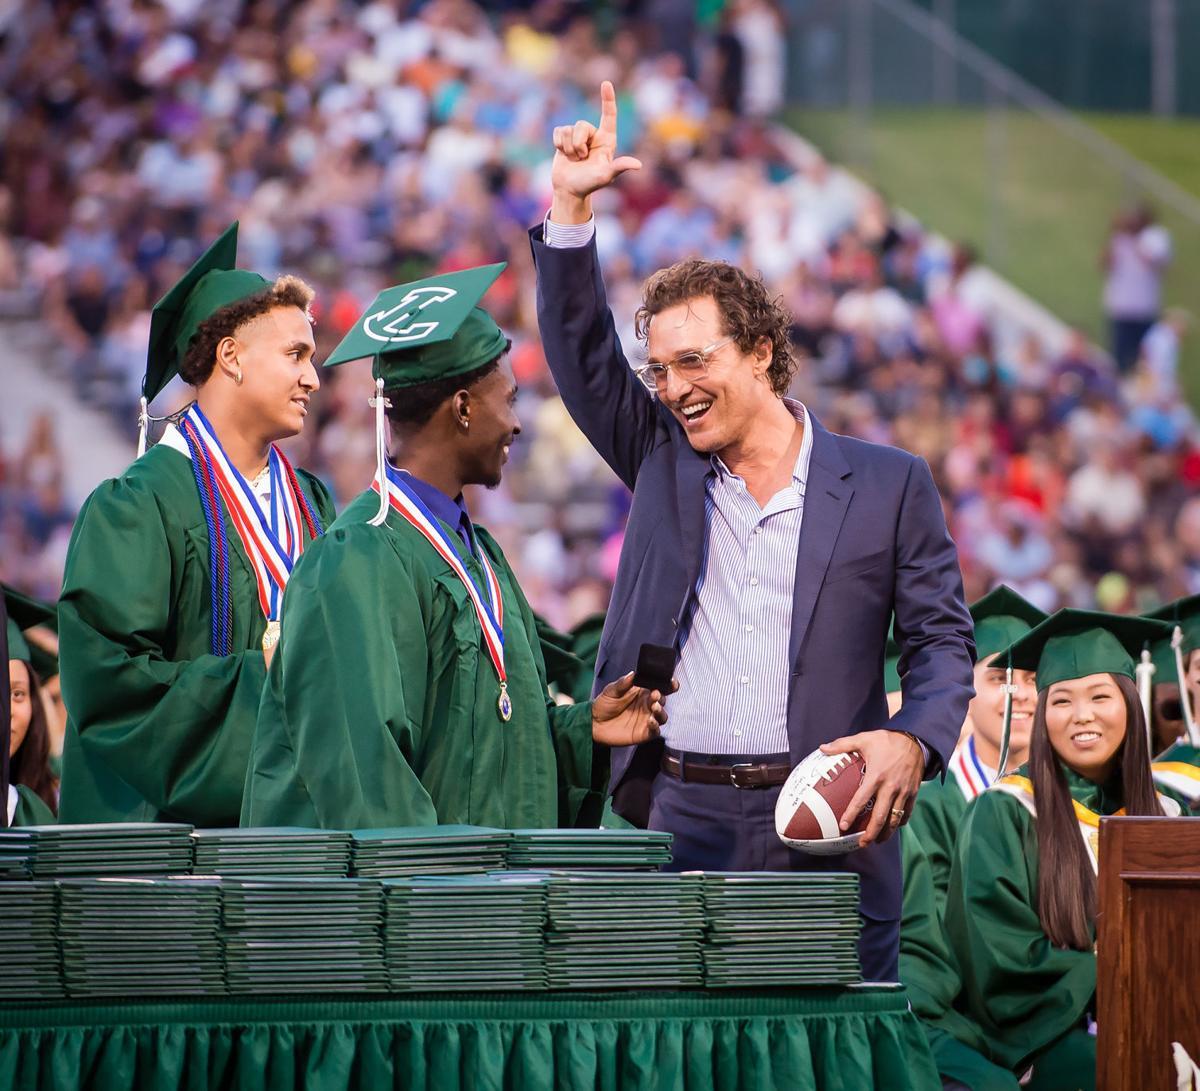 Longview High School 2019 graduation